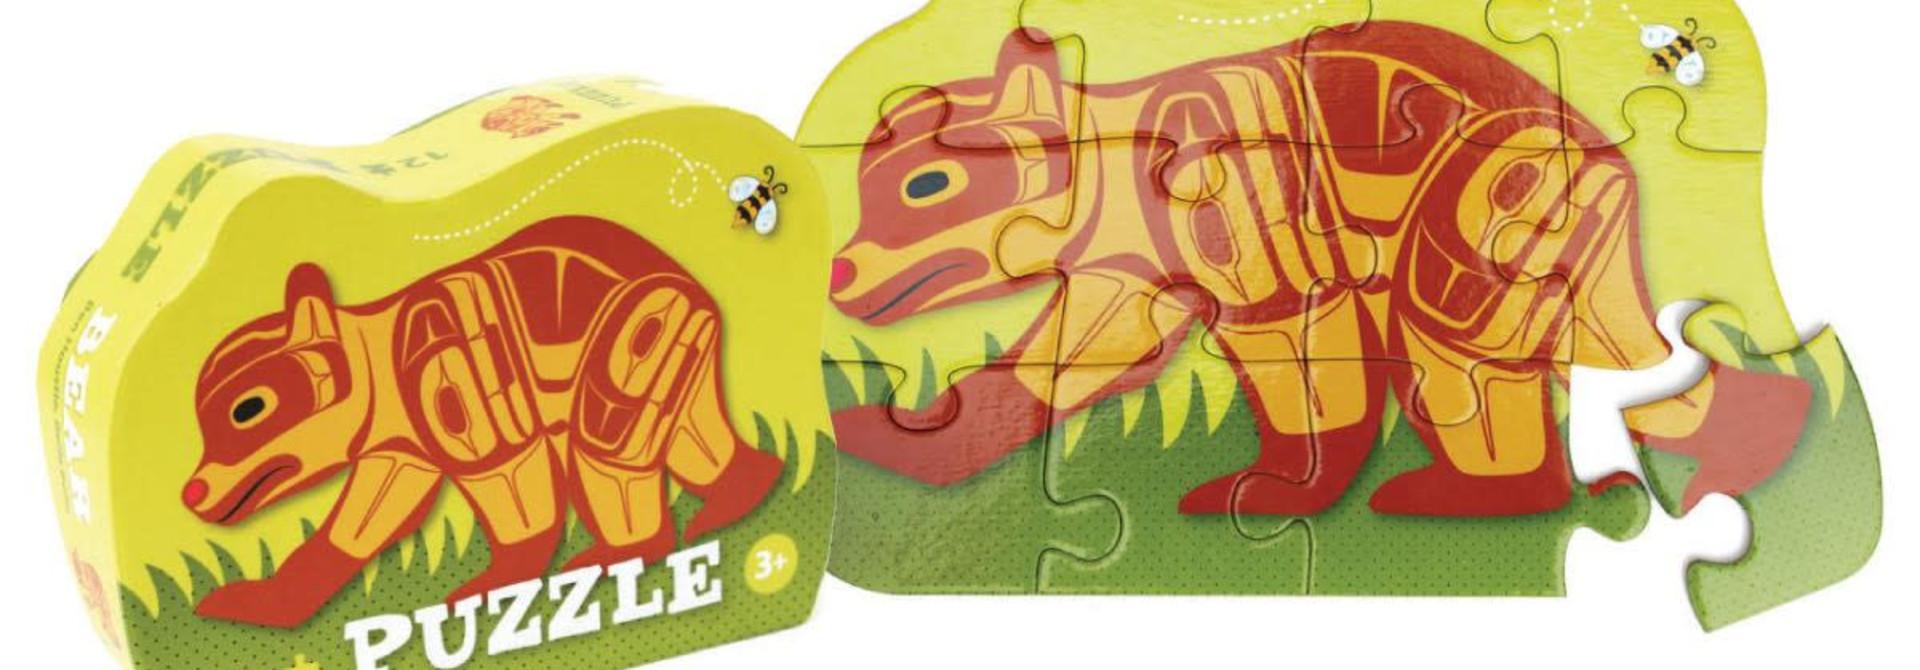 12 Piece Puzzle-Bear by Ben Houstie